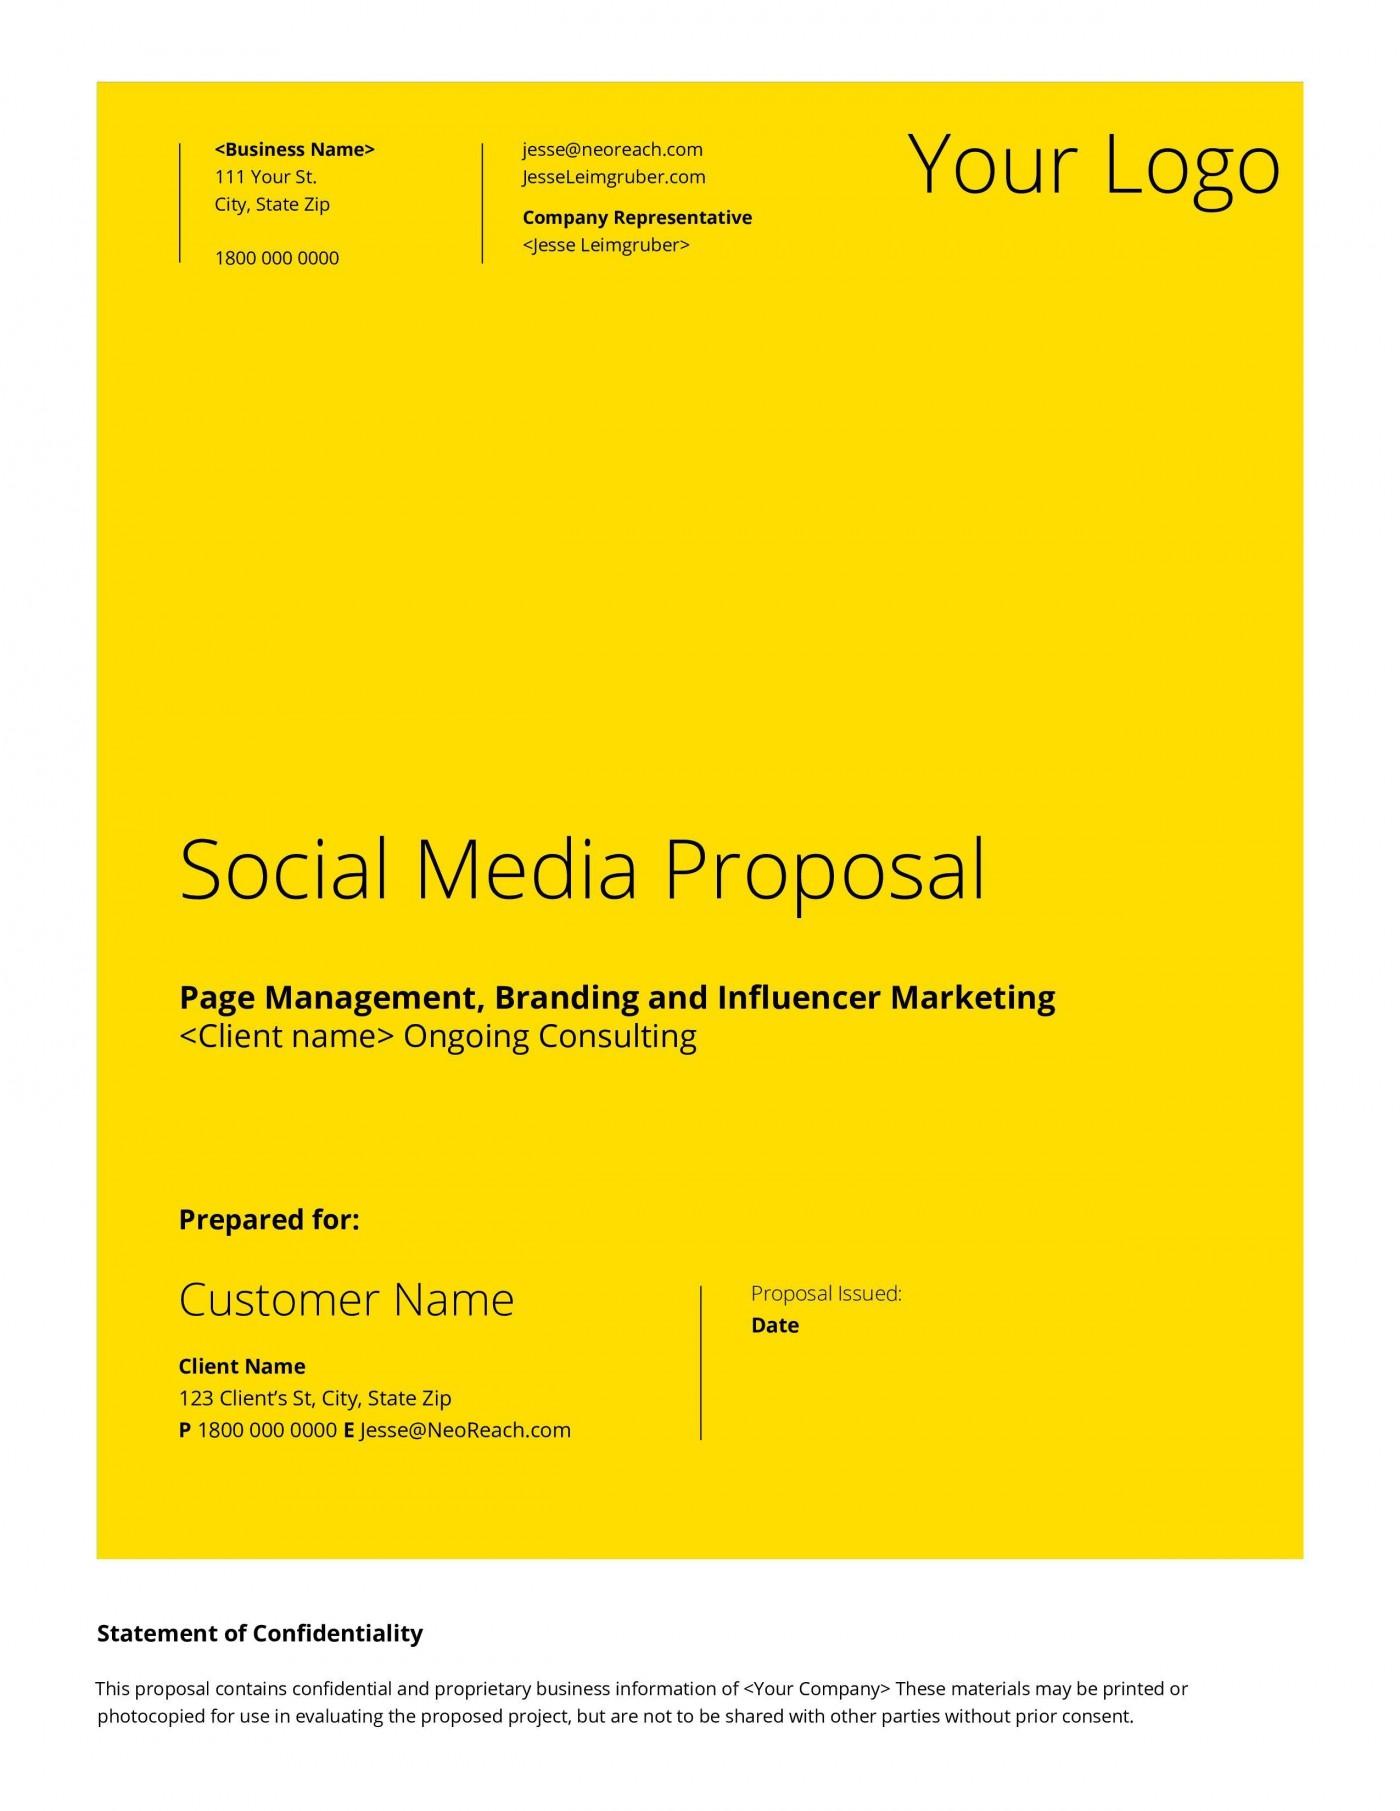 008 Frightening Social Media Proposal Template 2019 Inspiration 1400